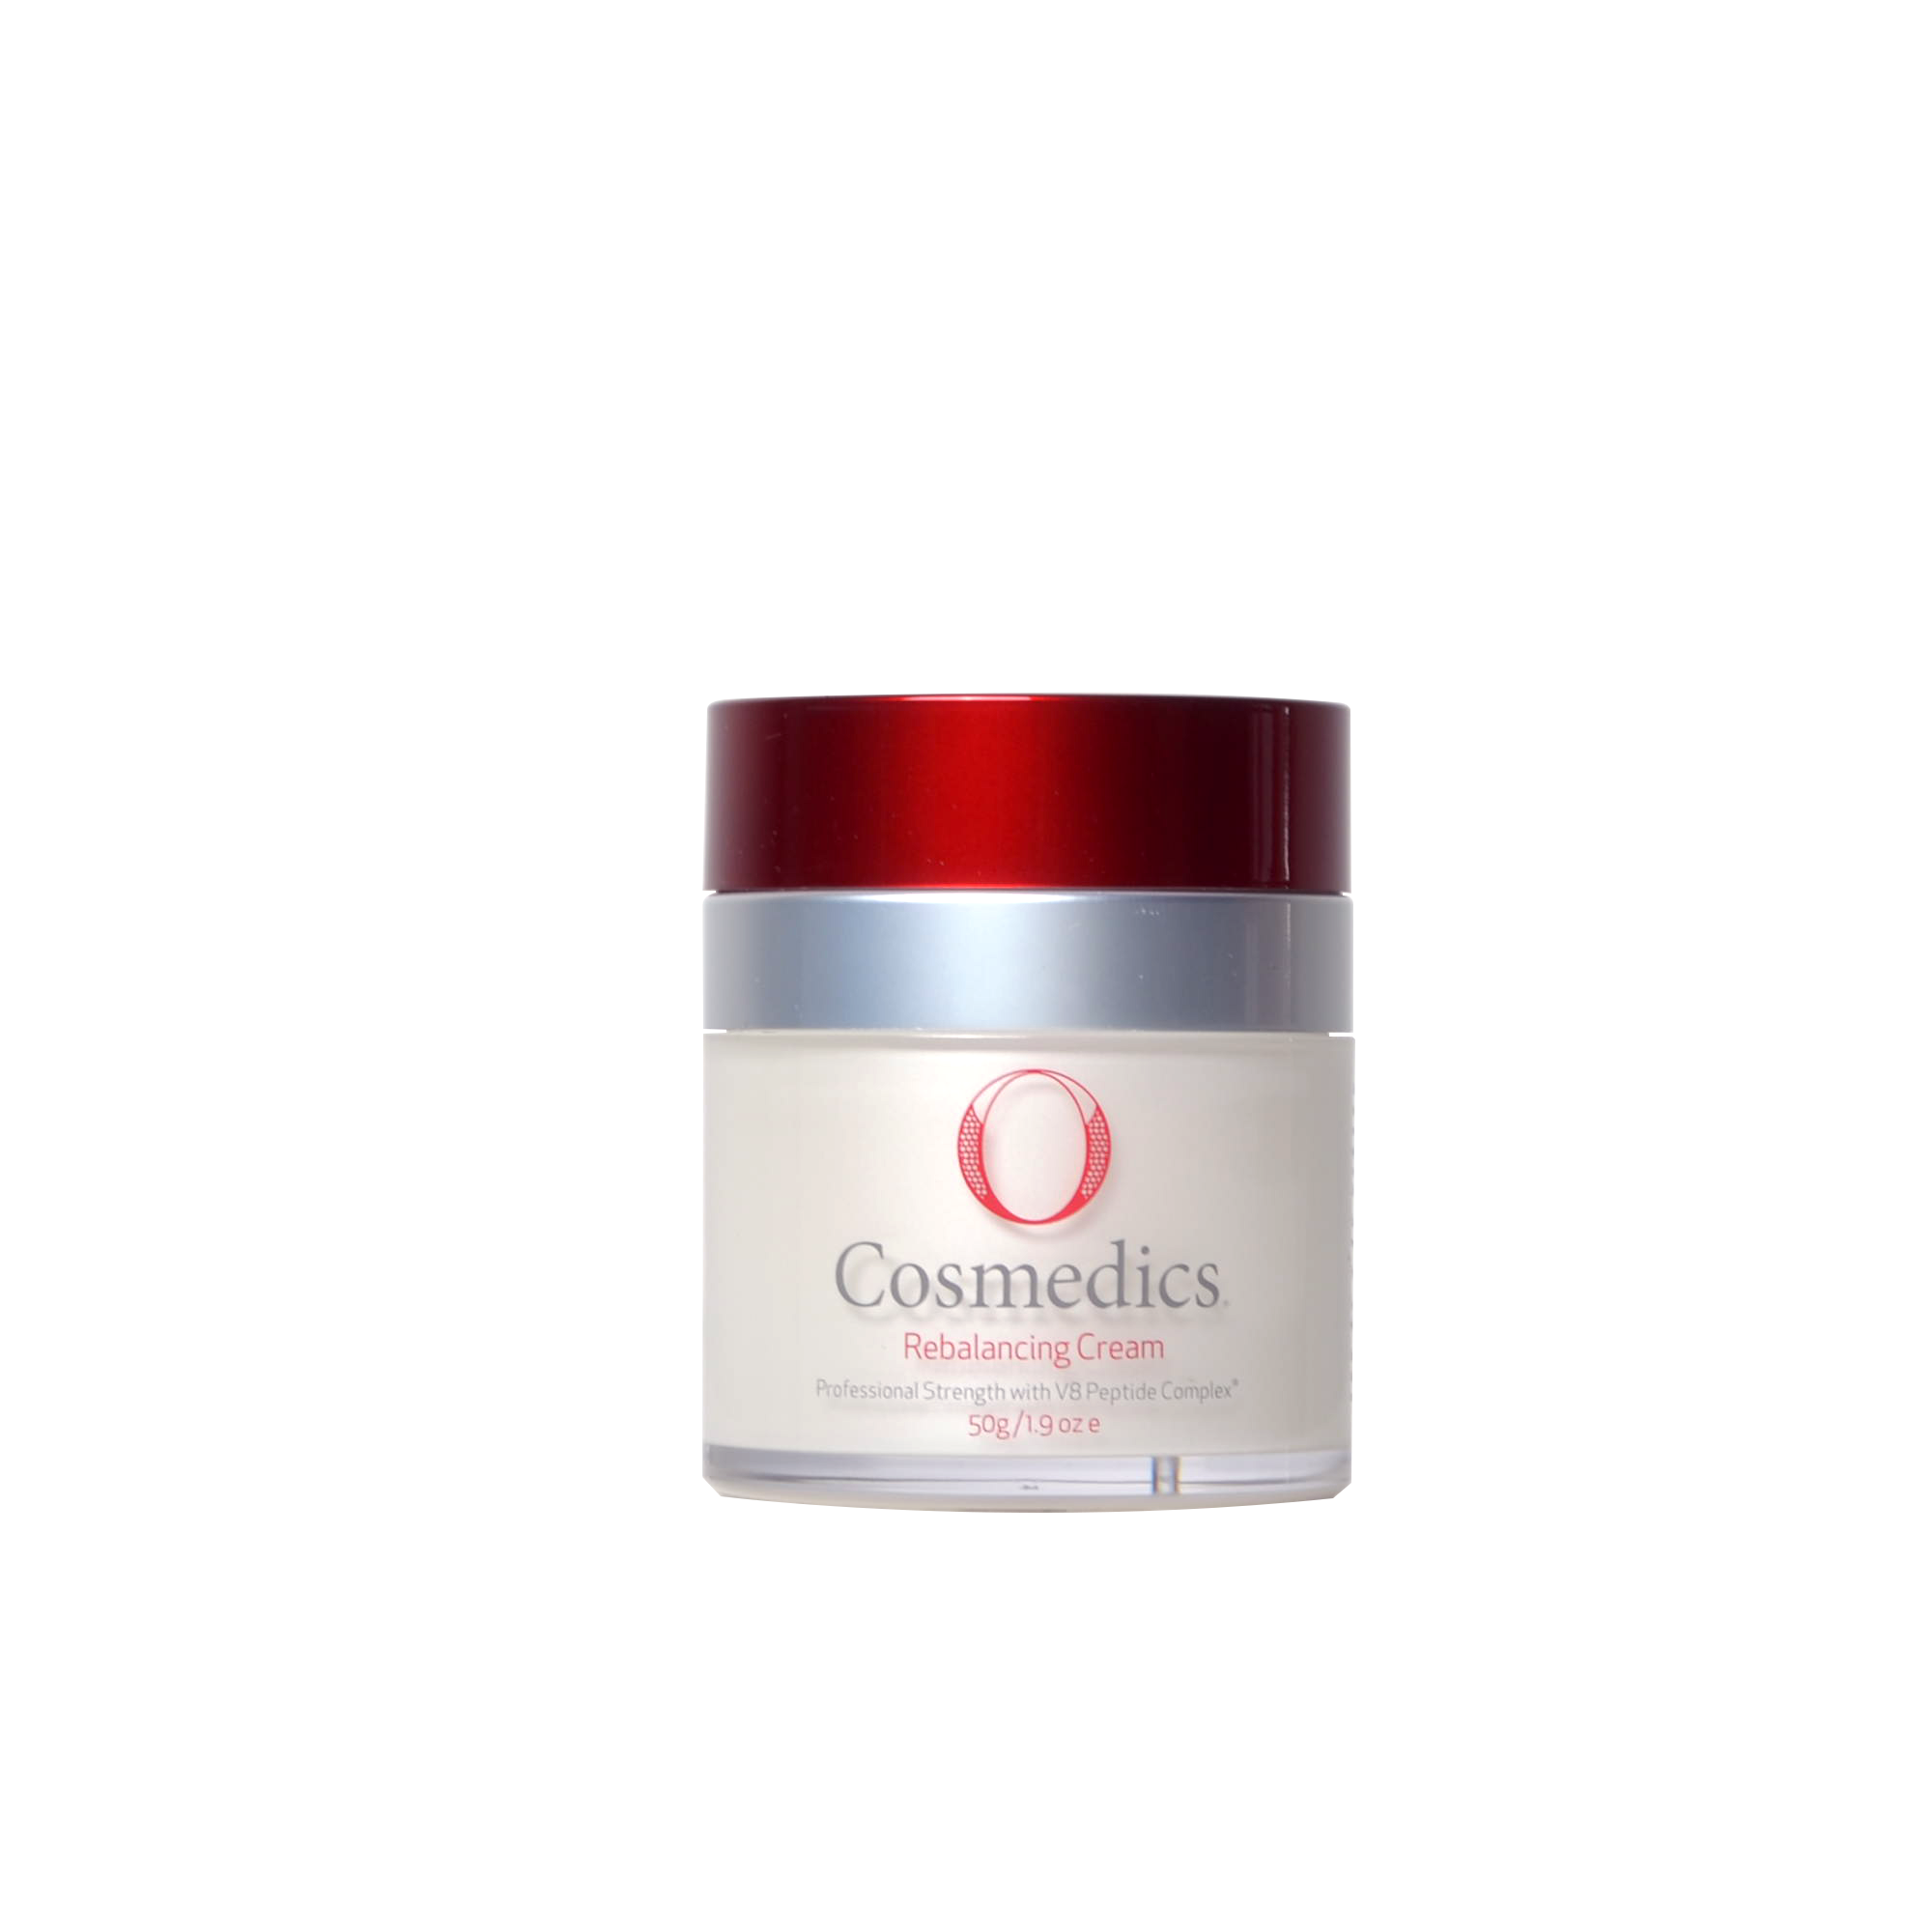 Rebalancing Cream - 50g